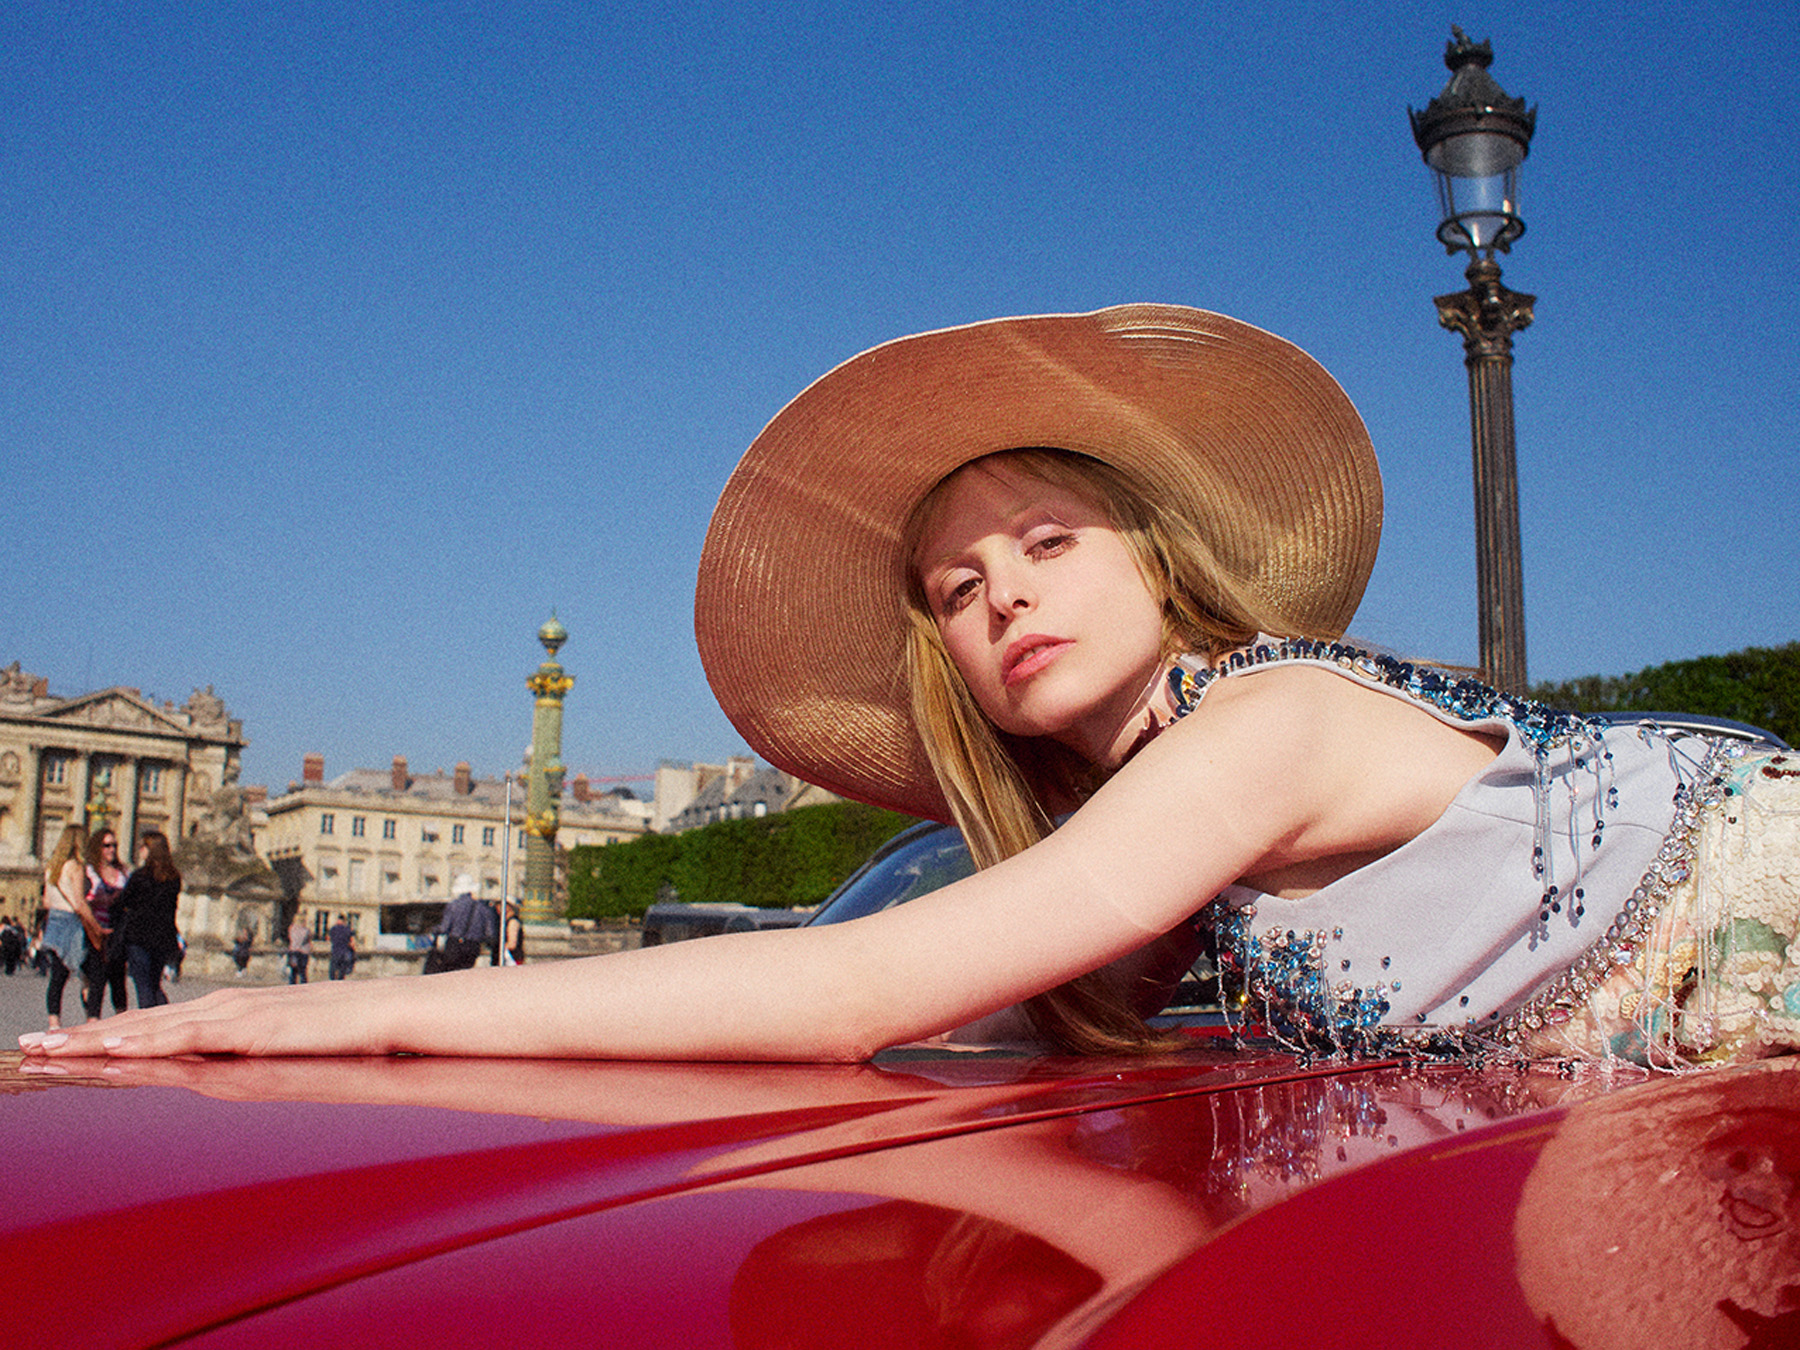 214-icon-artist-management-Kristin-Vicari-Fashion-Elle Japan x Petite Meller05.jpg